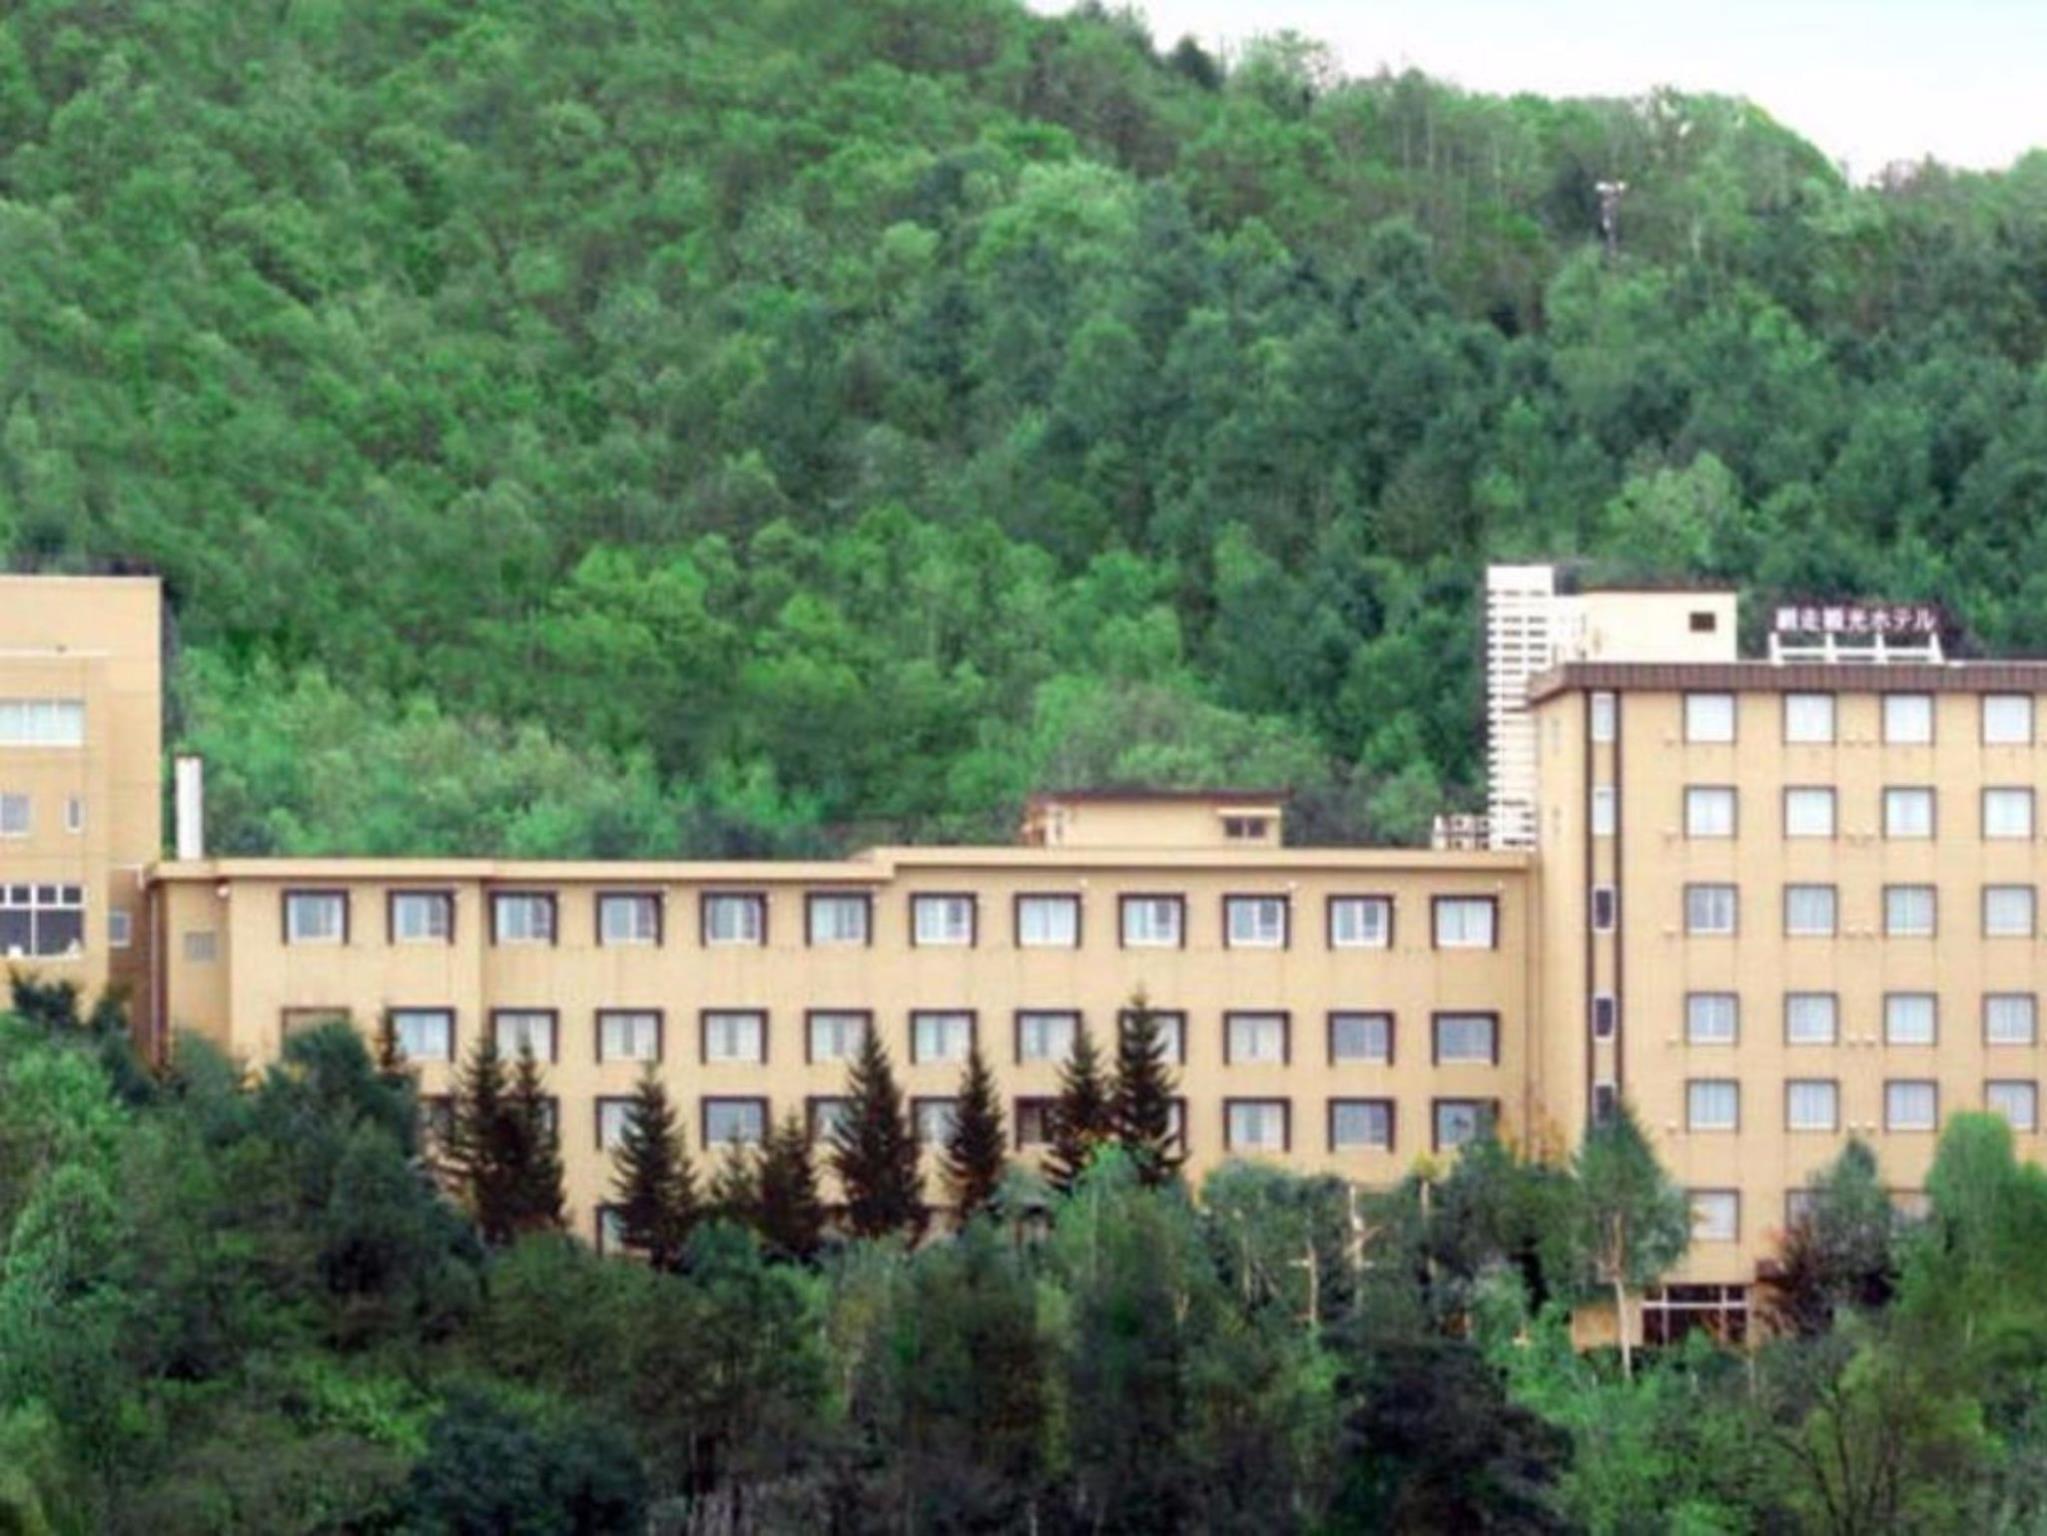 Abashiri Kanko Hotel